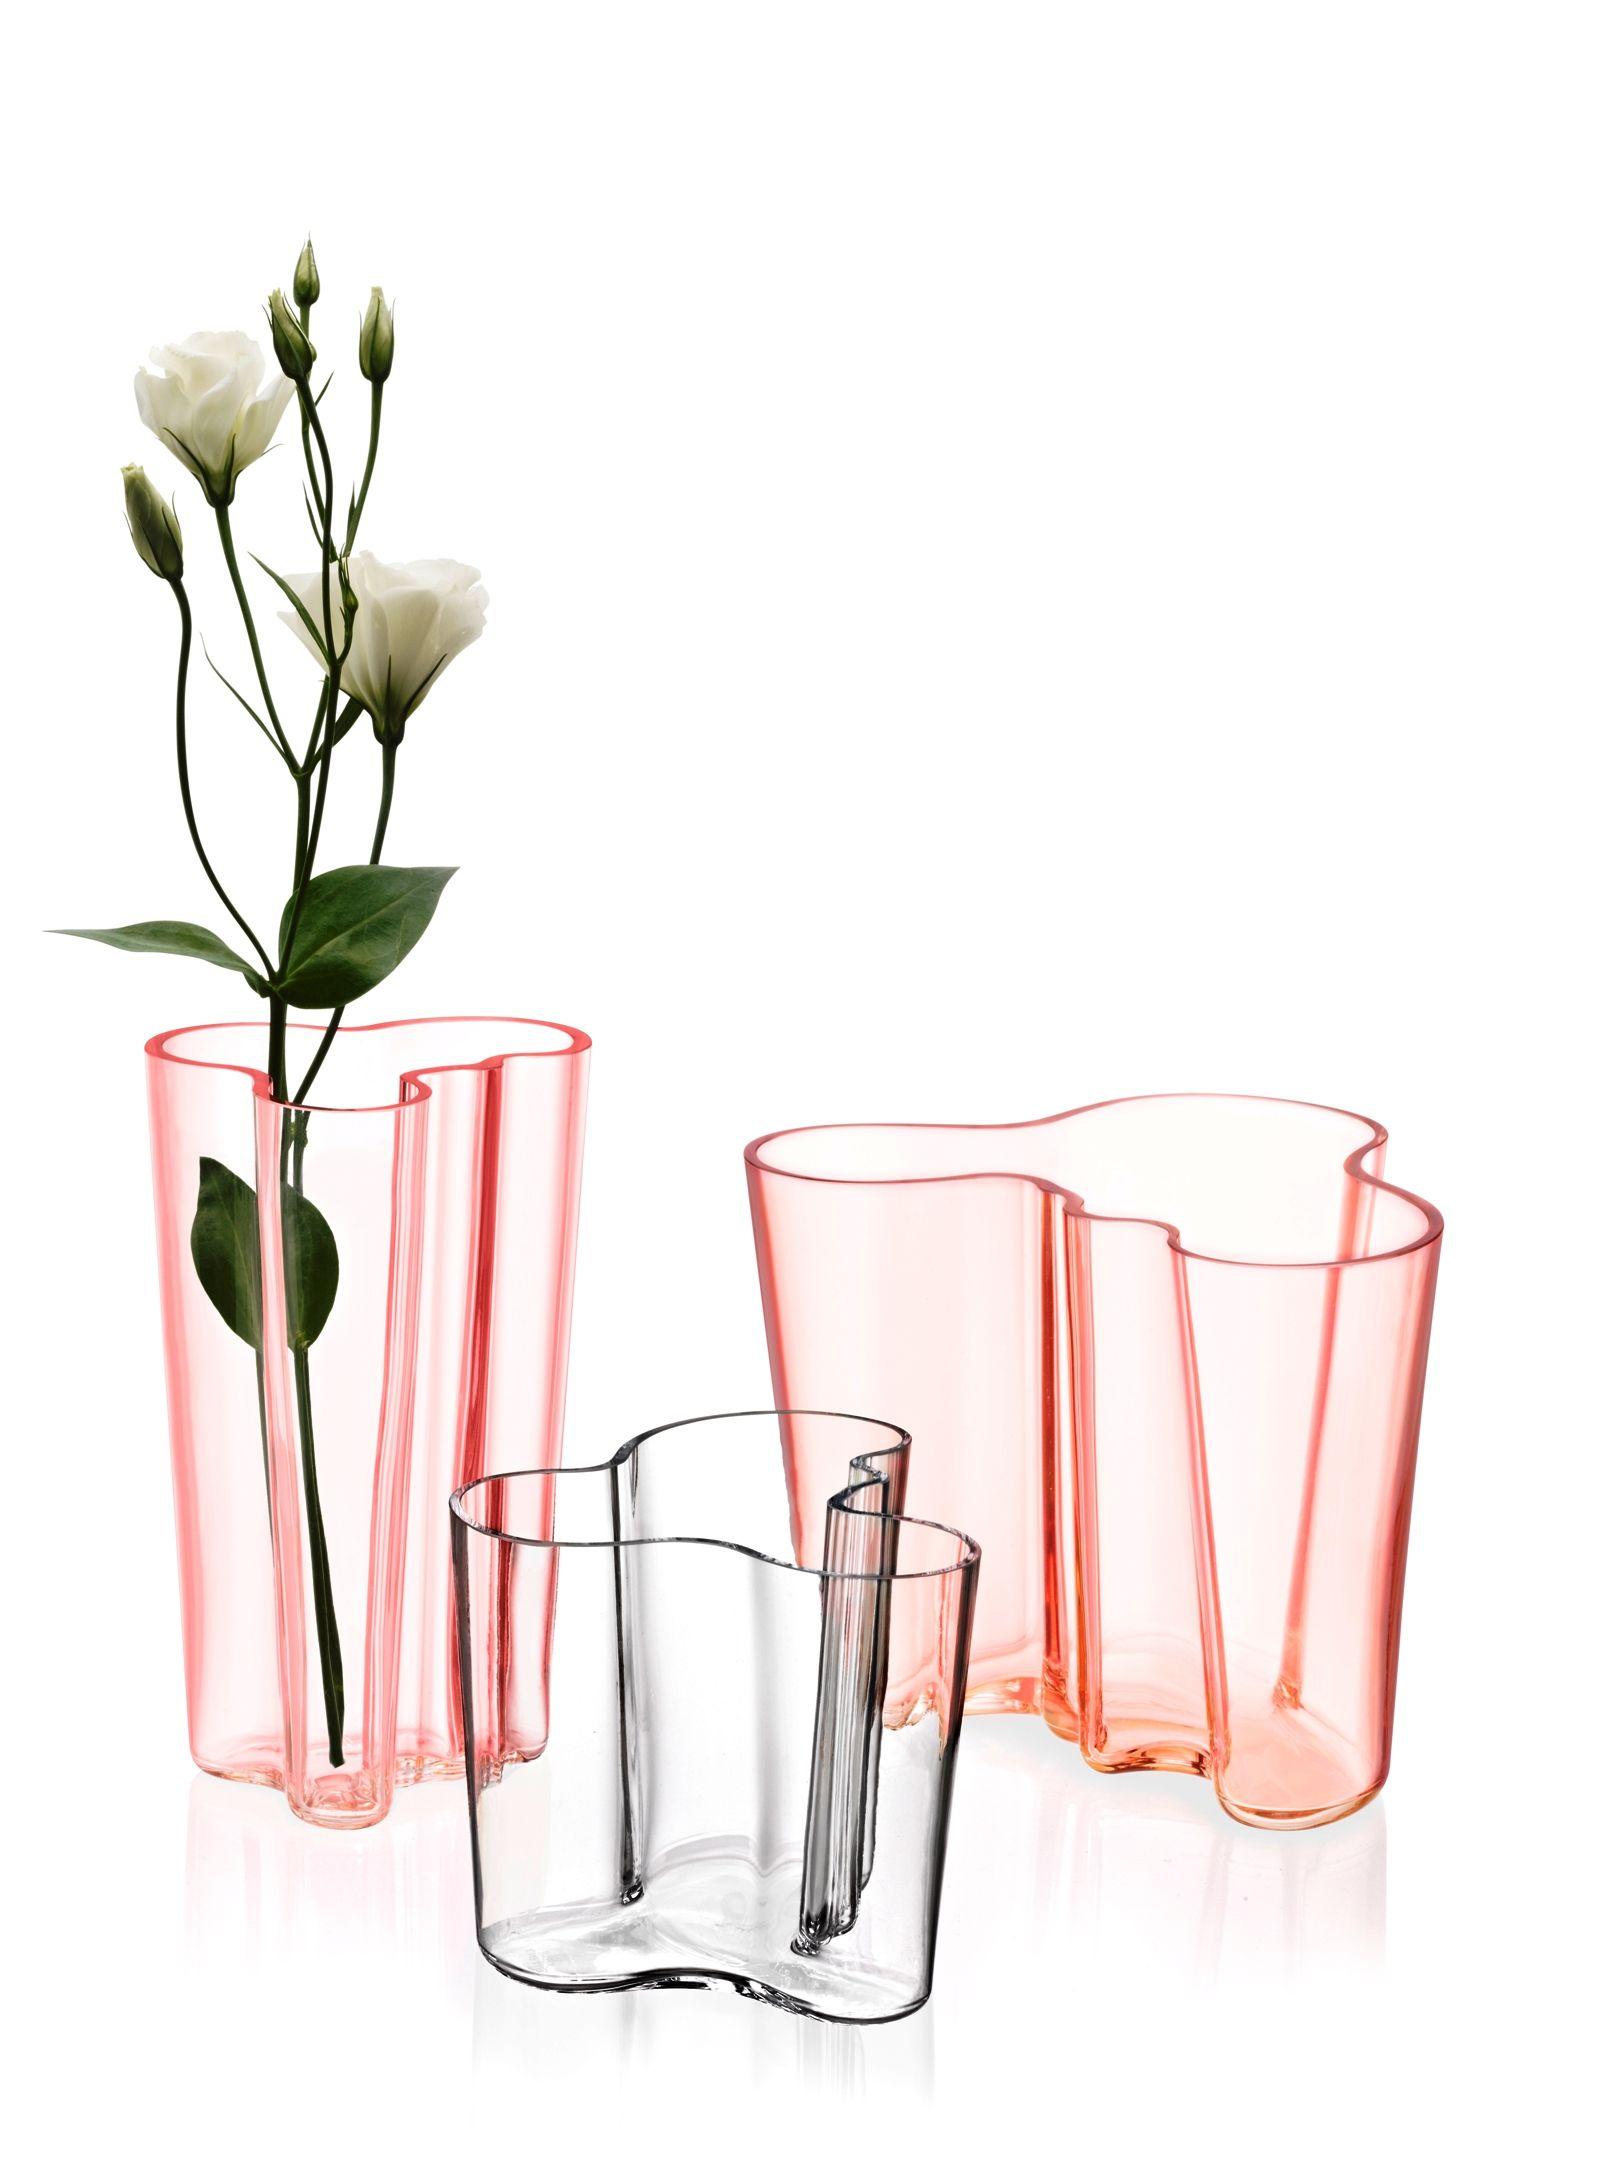 iittala - Aalto vase www.blossom.be www.facebook.com/blossomwavre